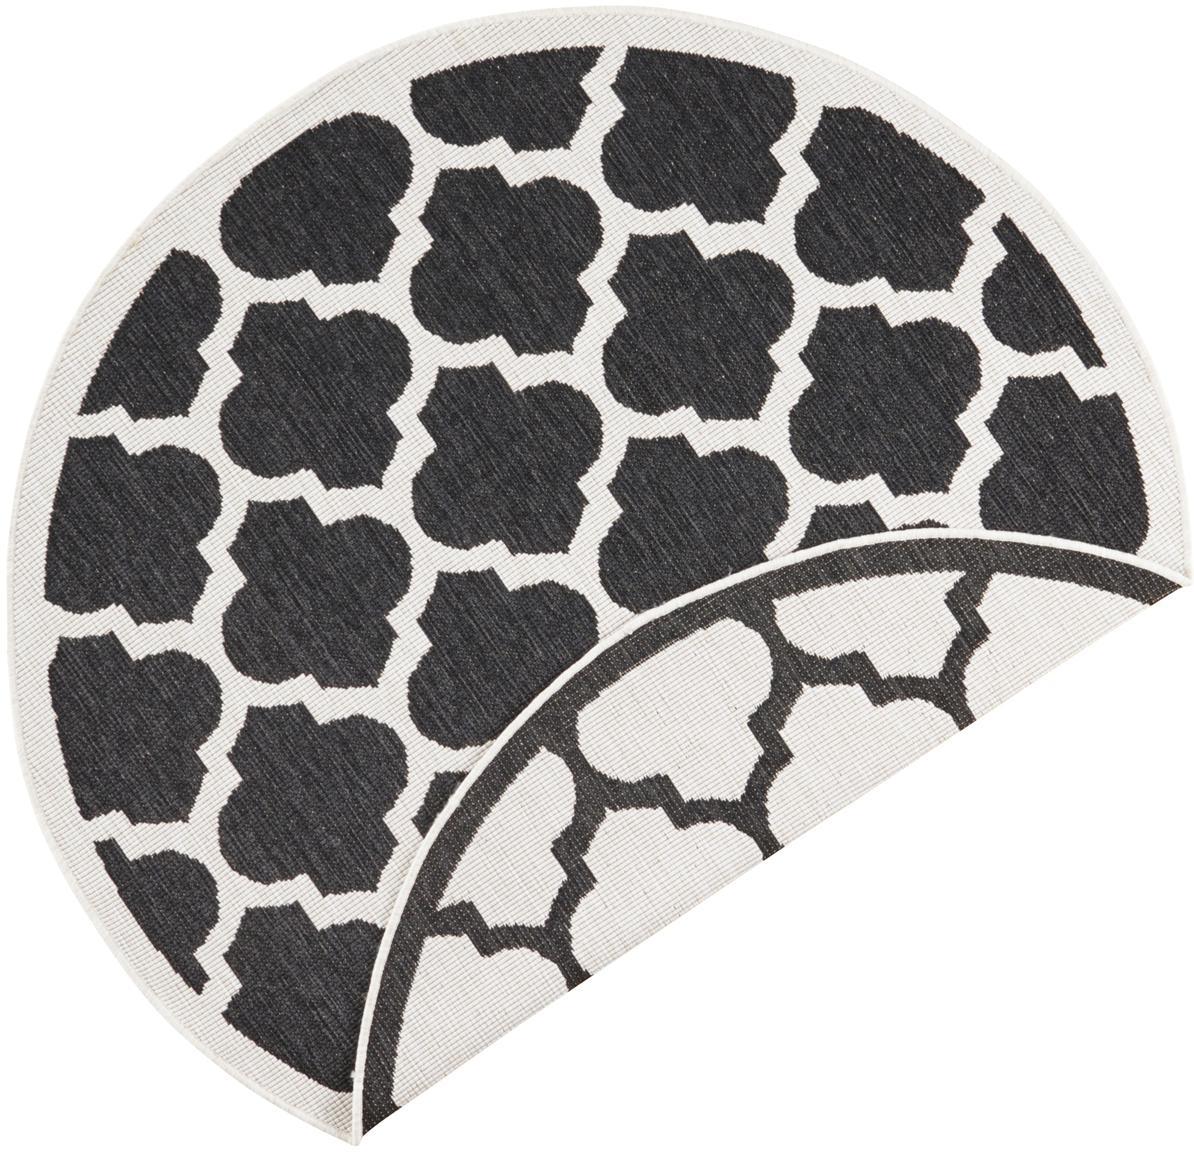 Alfombra redonda reversible de interior/exterior Palermo, Negro, crema, Ø 200 cm (Tamaño L)